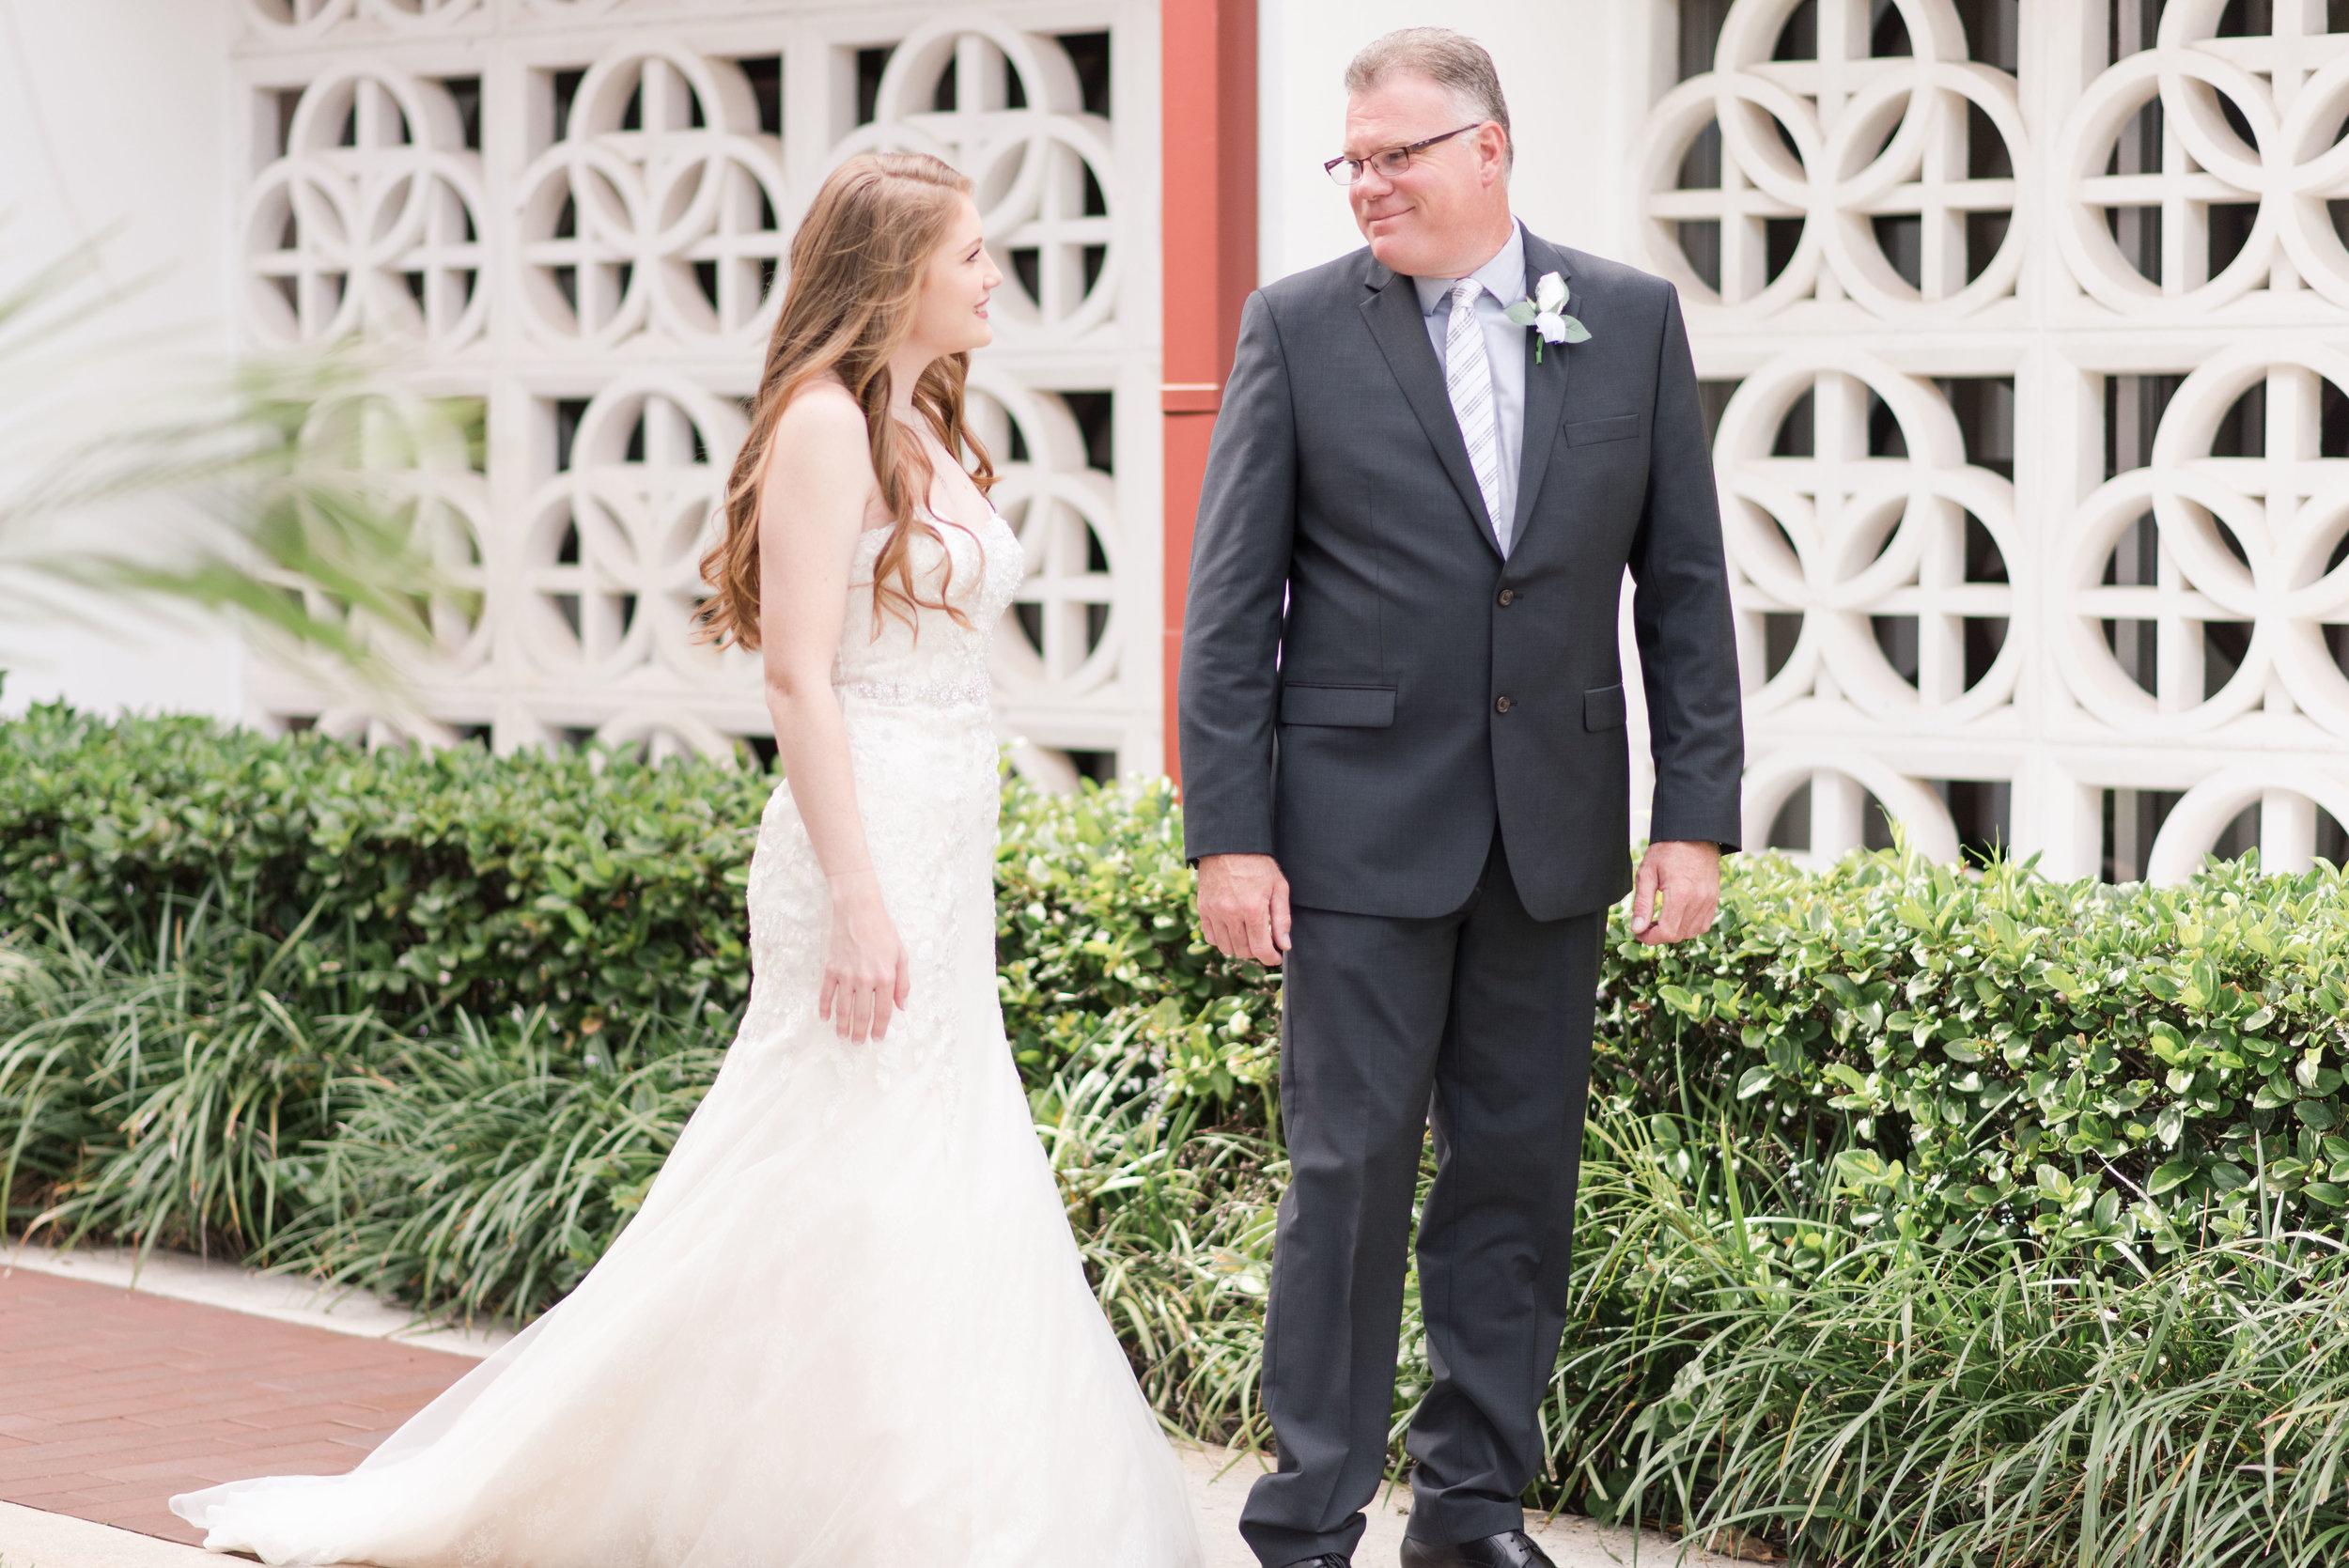 2019_04_06_Hart_Wedding_CMageePhotography_7.jpg